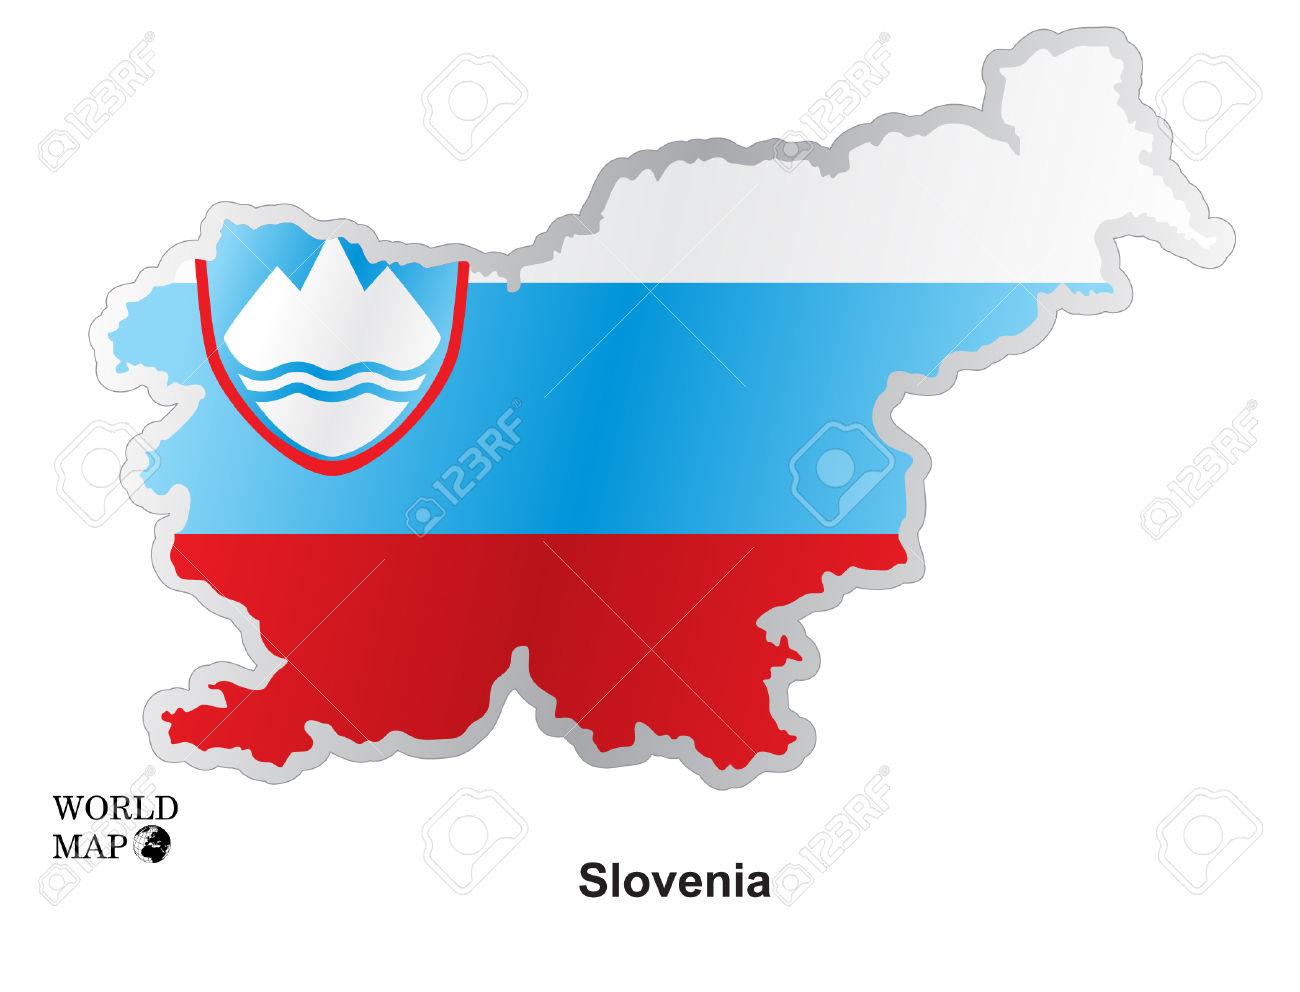 Mapa Eslov Royalty Free Cliparts, Vetores, E Ilustrações Stock.